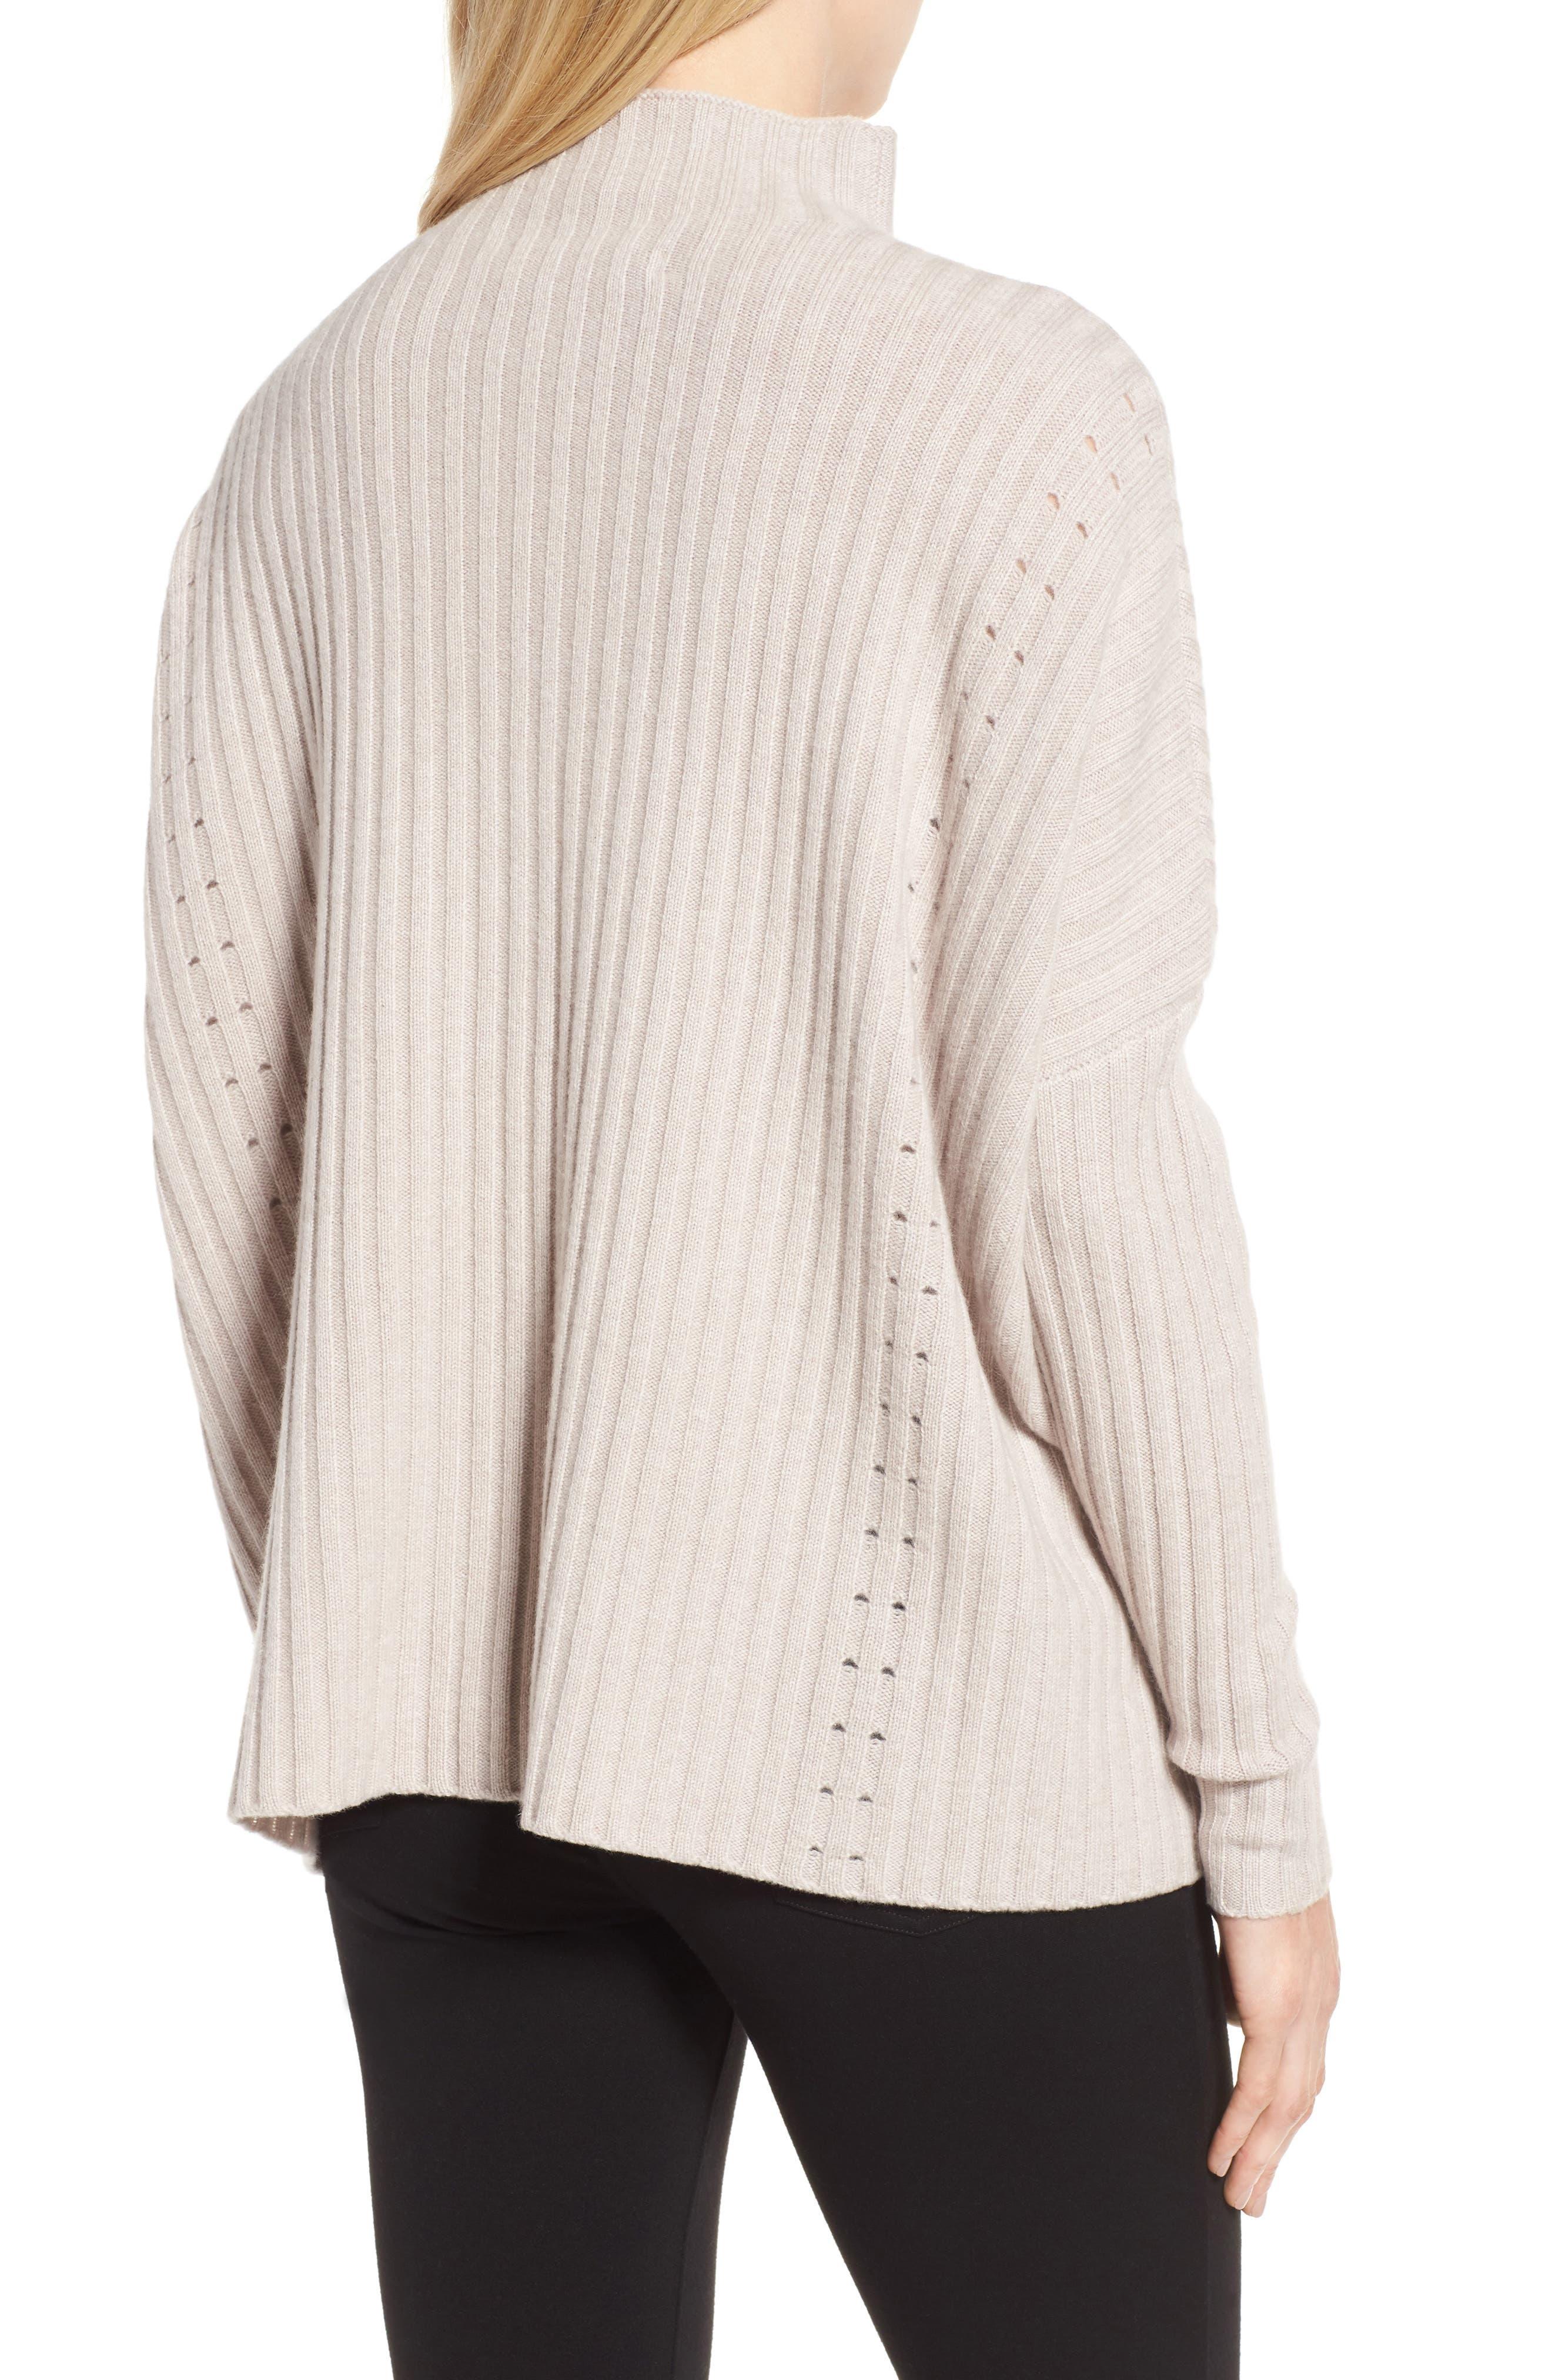 Alternate Image 2  - Nordstrom Signature Boxy Ribbed Cashmere Sweater